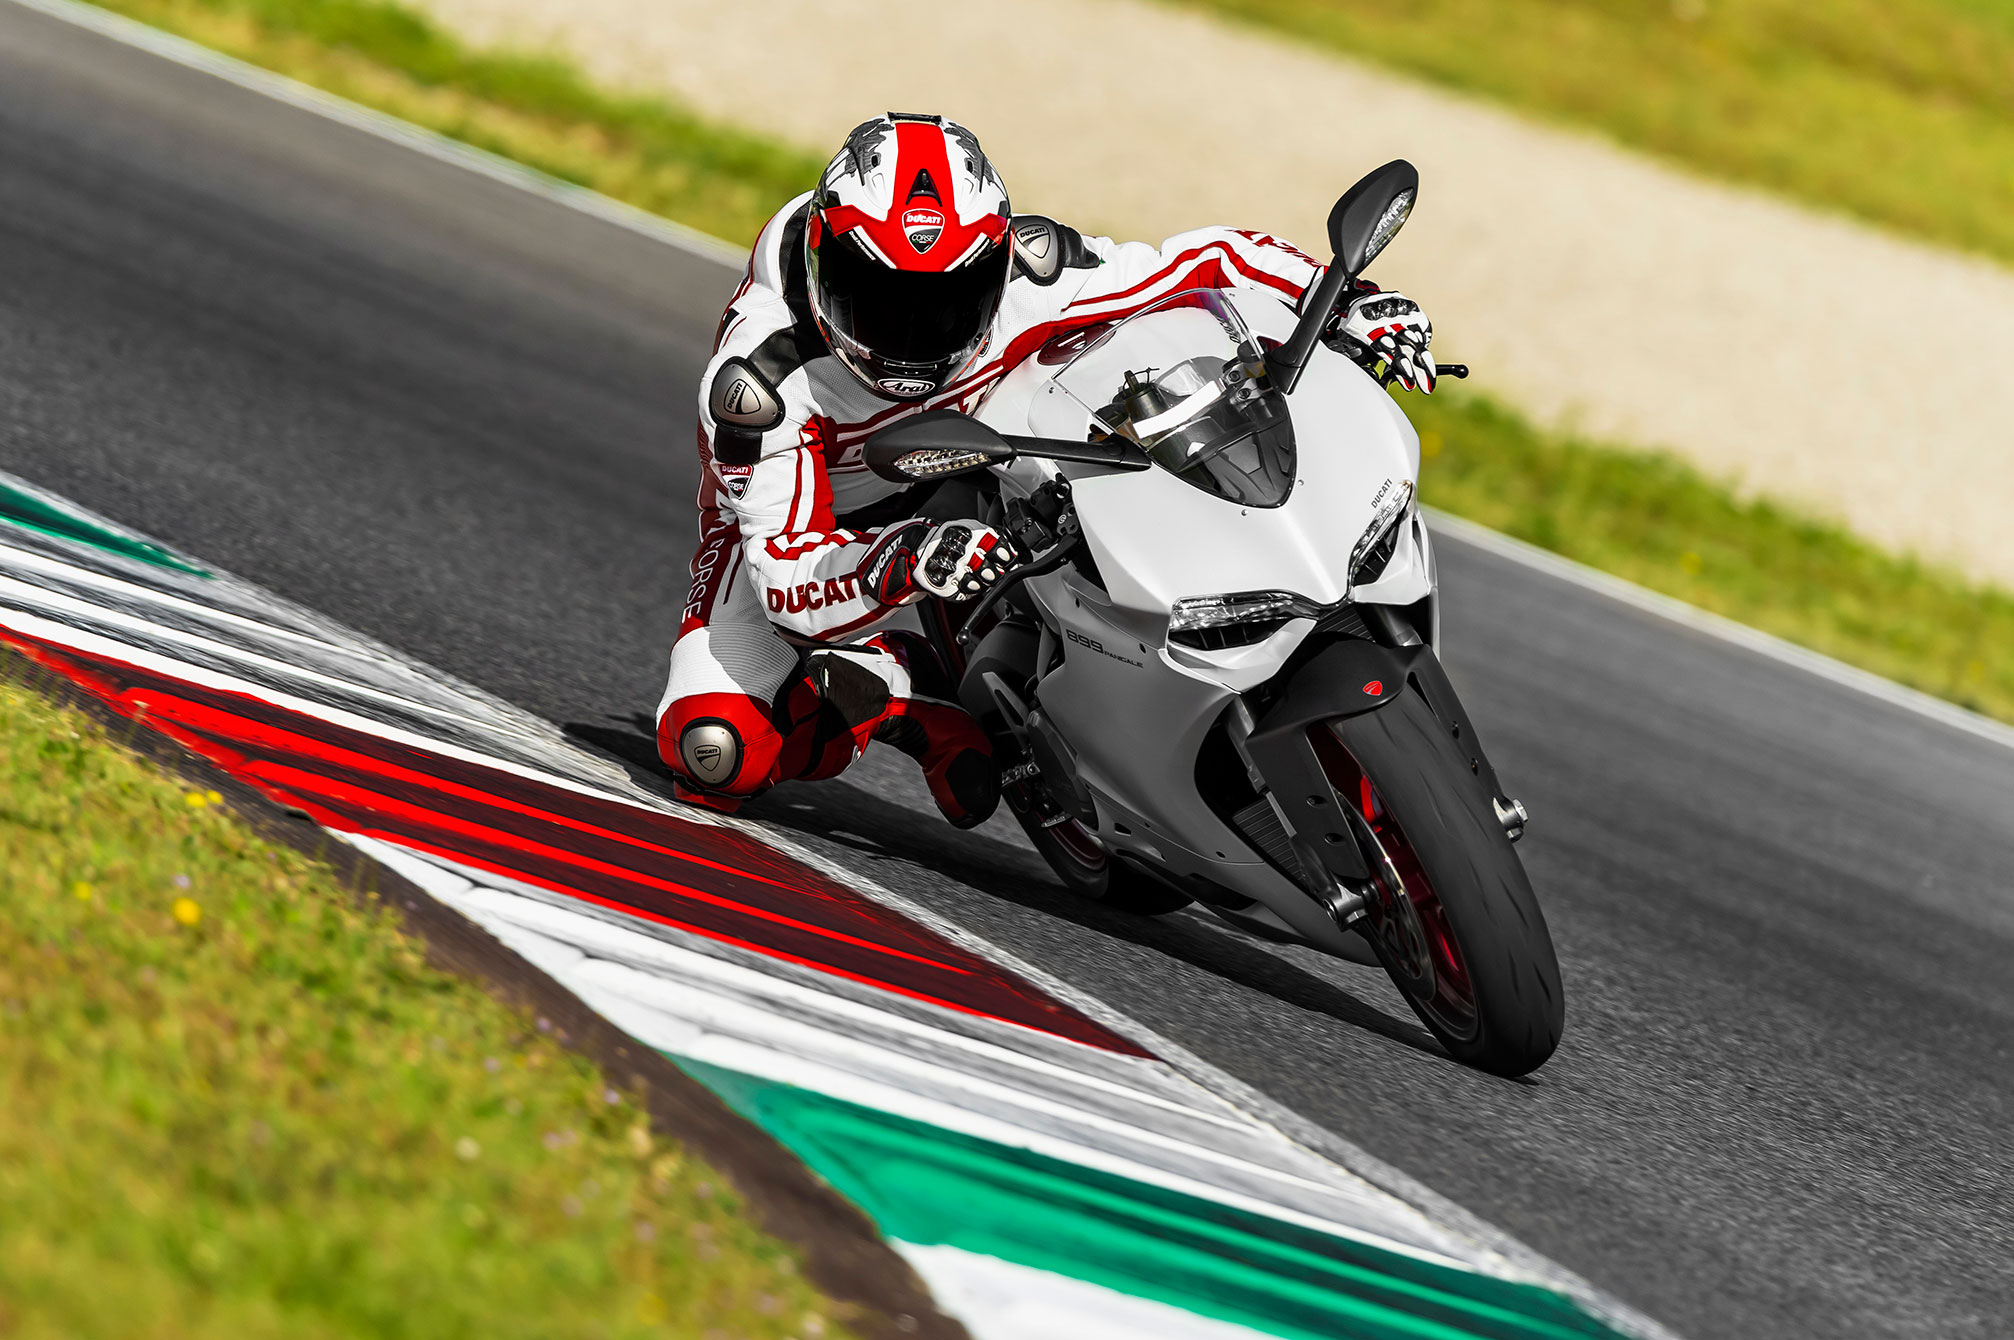 2014 Ducati Superbike 899 Panigale fg wallpaper 2014x1340 150892 2014x1340